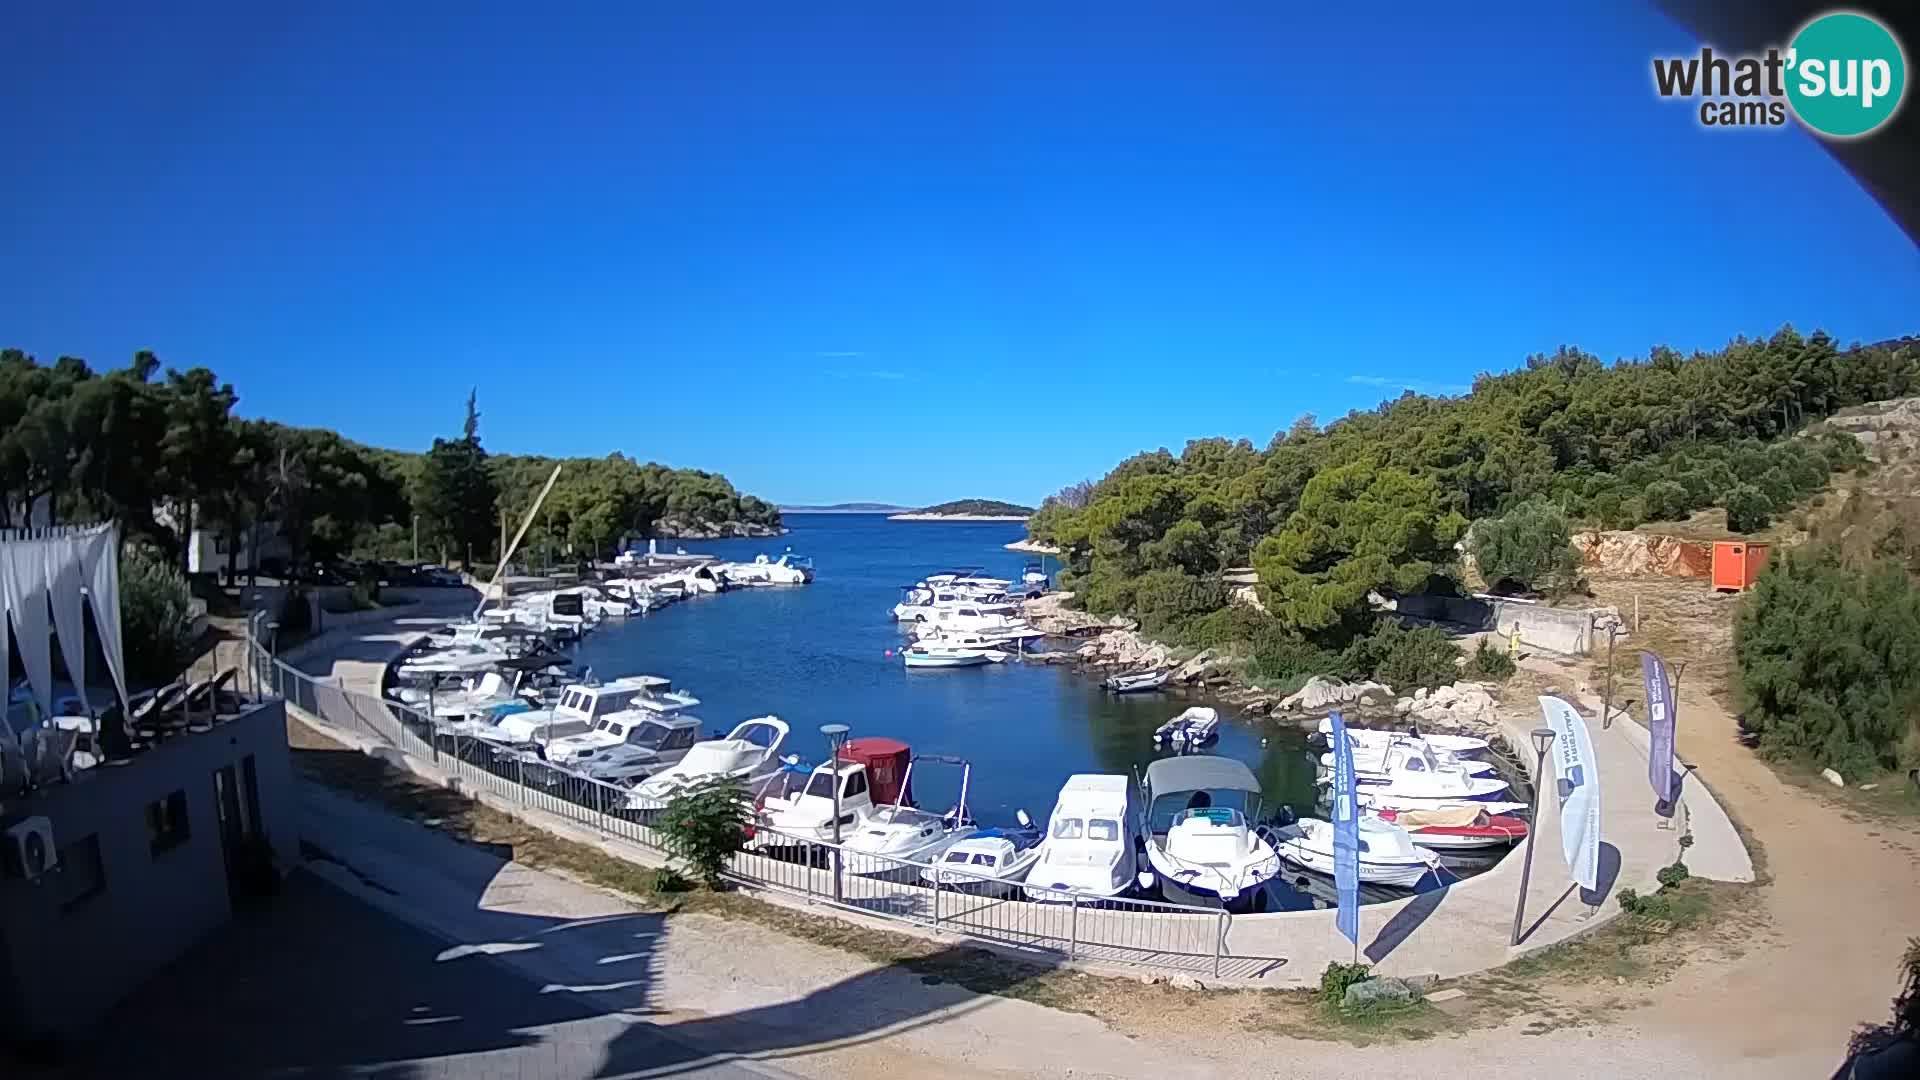 Camera en vivo Sovlje – ANTIC bahía – Tribunj